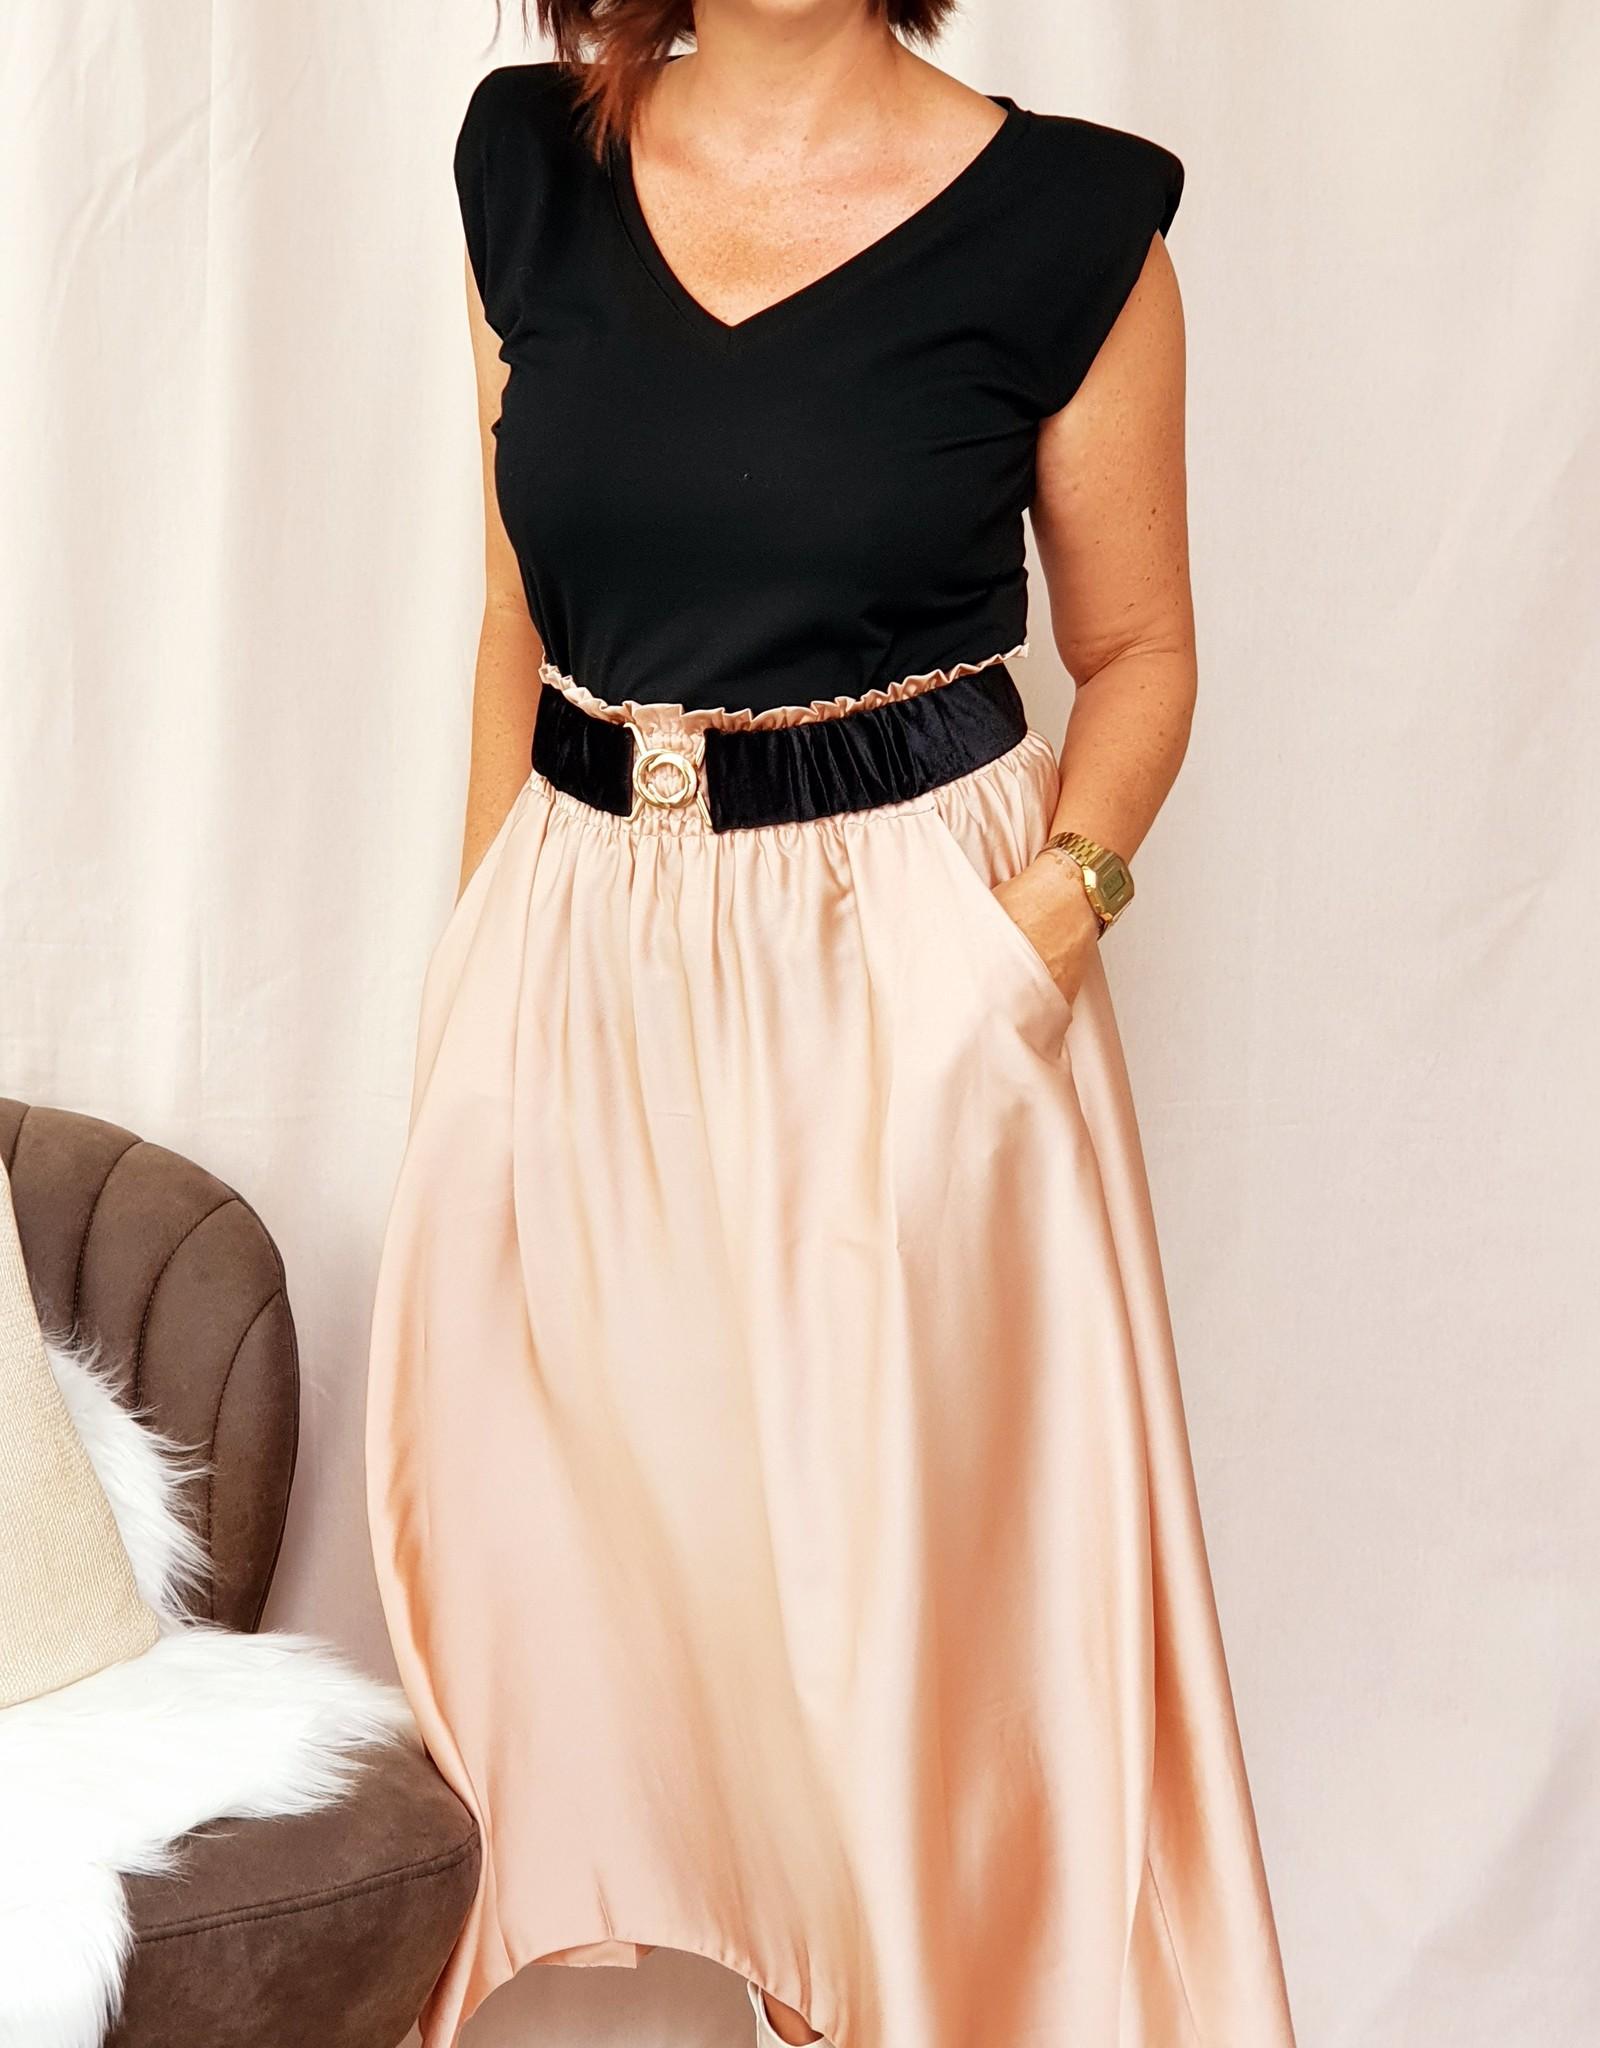 Nude pink satin skirt